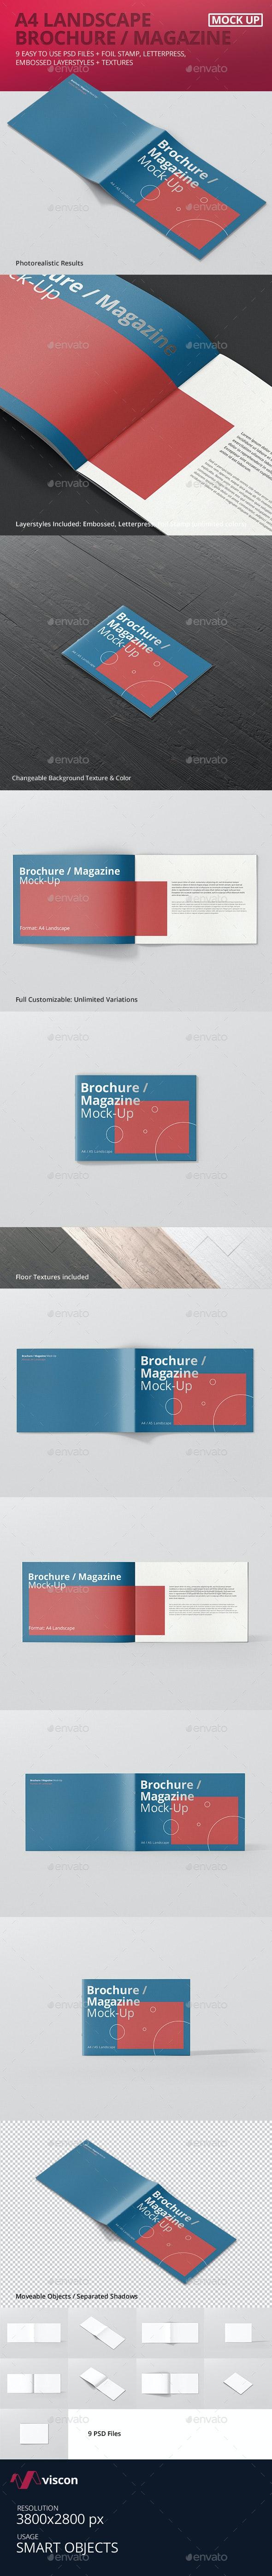 A4 Landscape Brochure / Magazine Mock-Up - Magazines Print